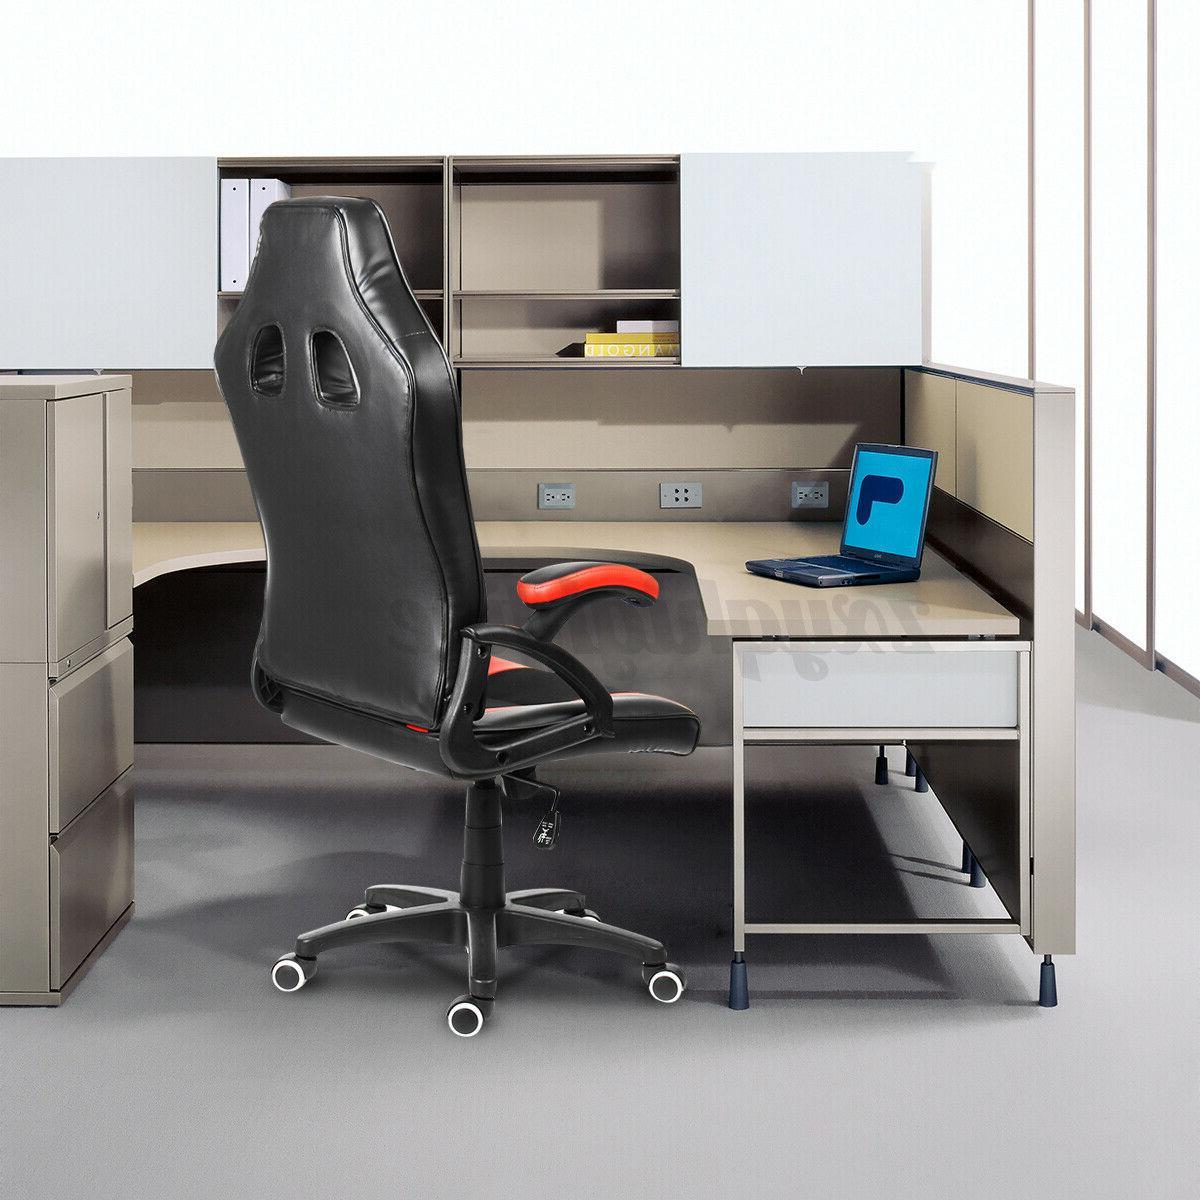 High Office Chair Ergonomic Racing